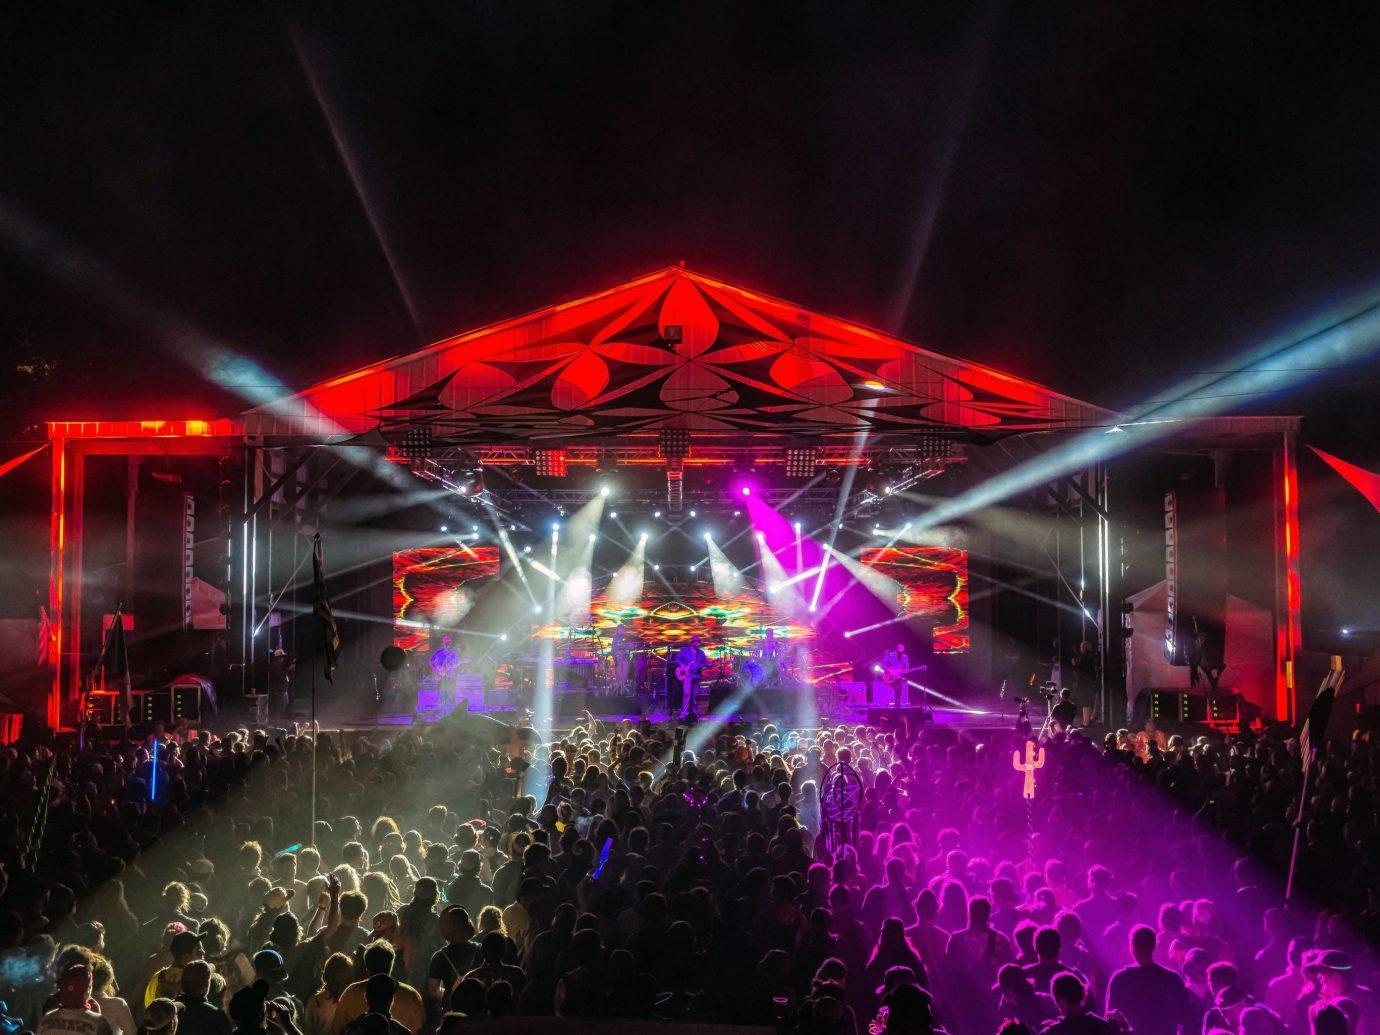 Arts + Culture performance rock concert night outdoor scene stage performing arts nightclub Entertainment concert Music music venue musical theatre light disco laser